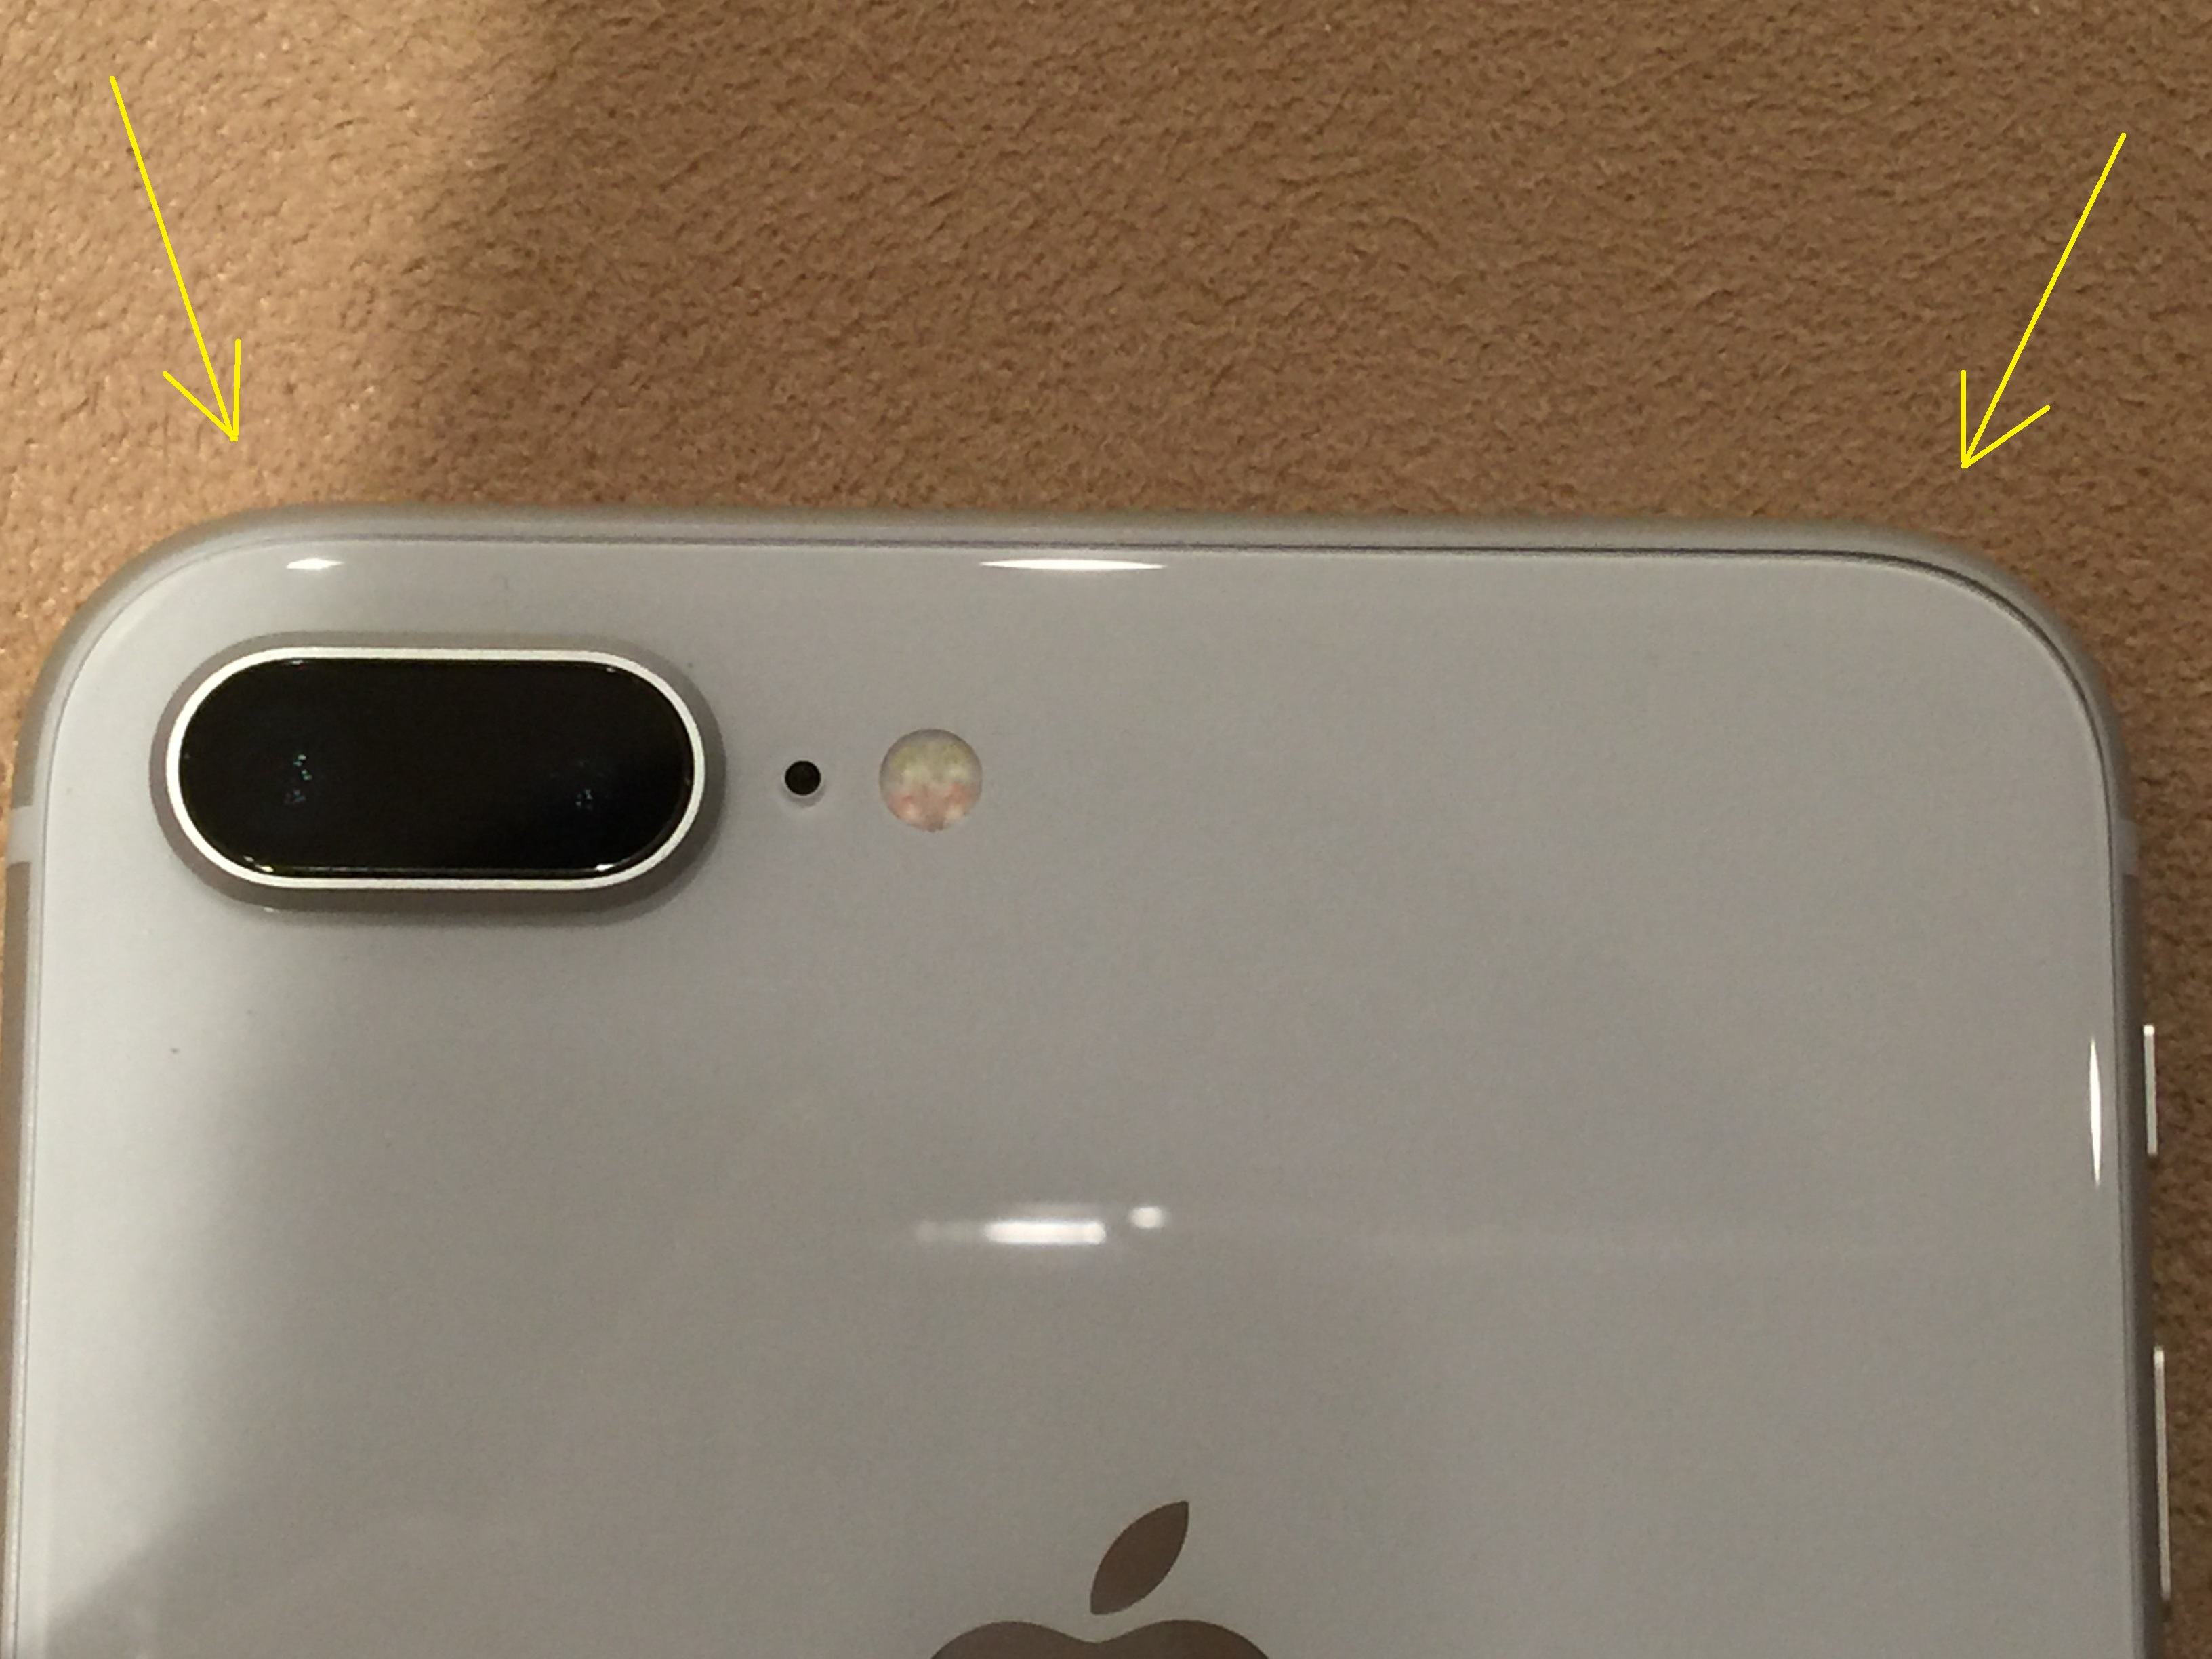 huge discount e1587 dea25 iPhone 8 Plus glass frame gaps | MacRumors Forums